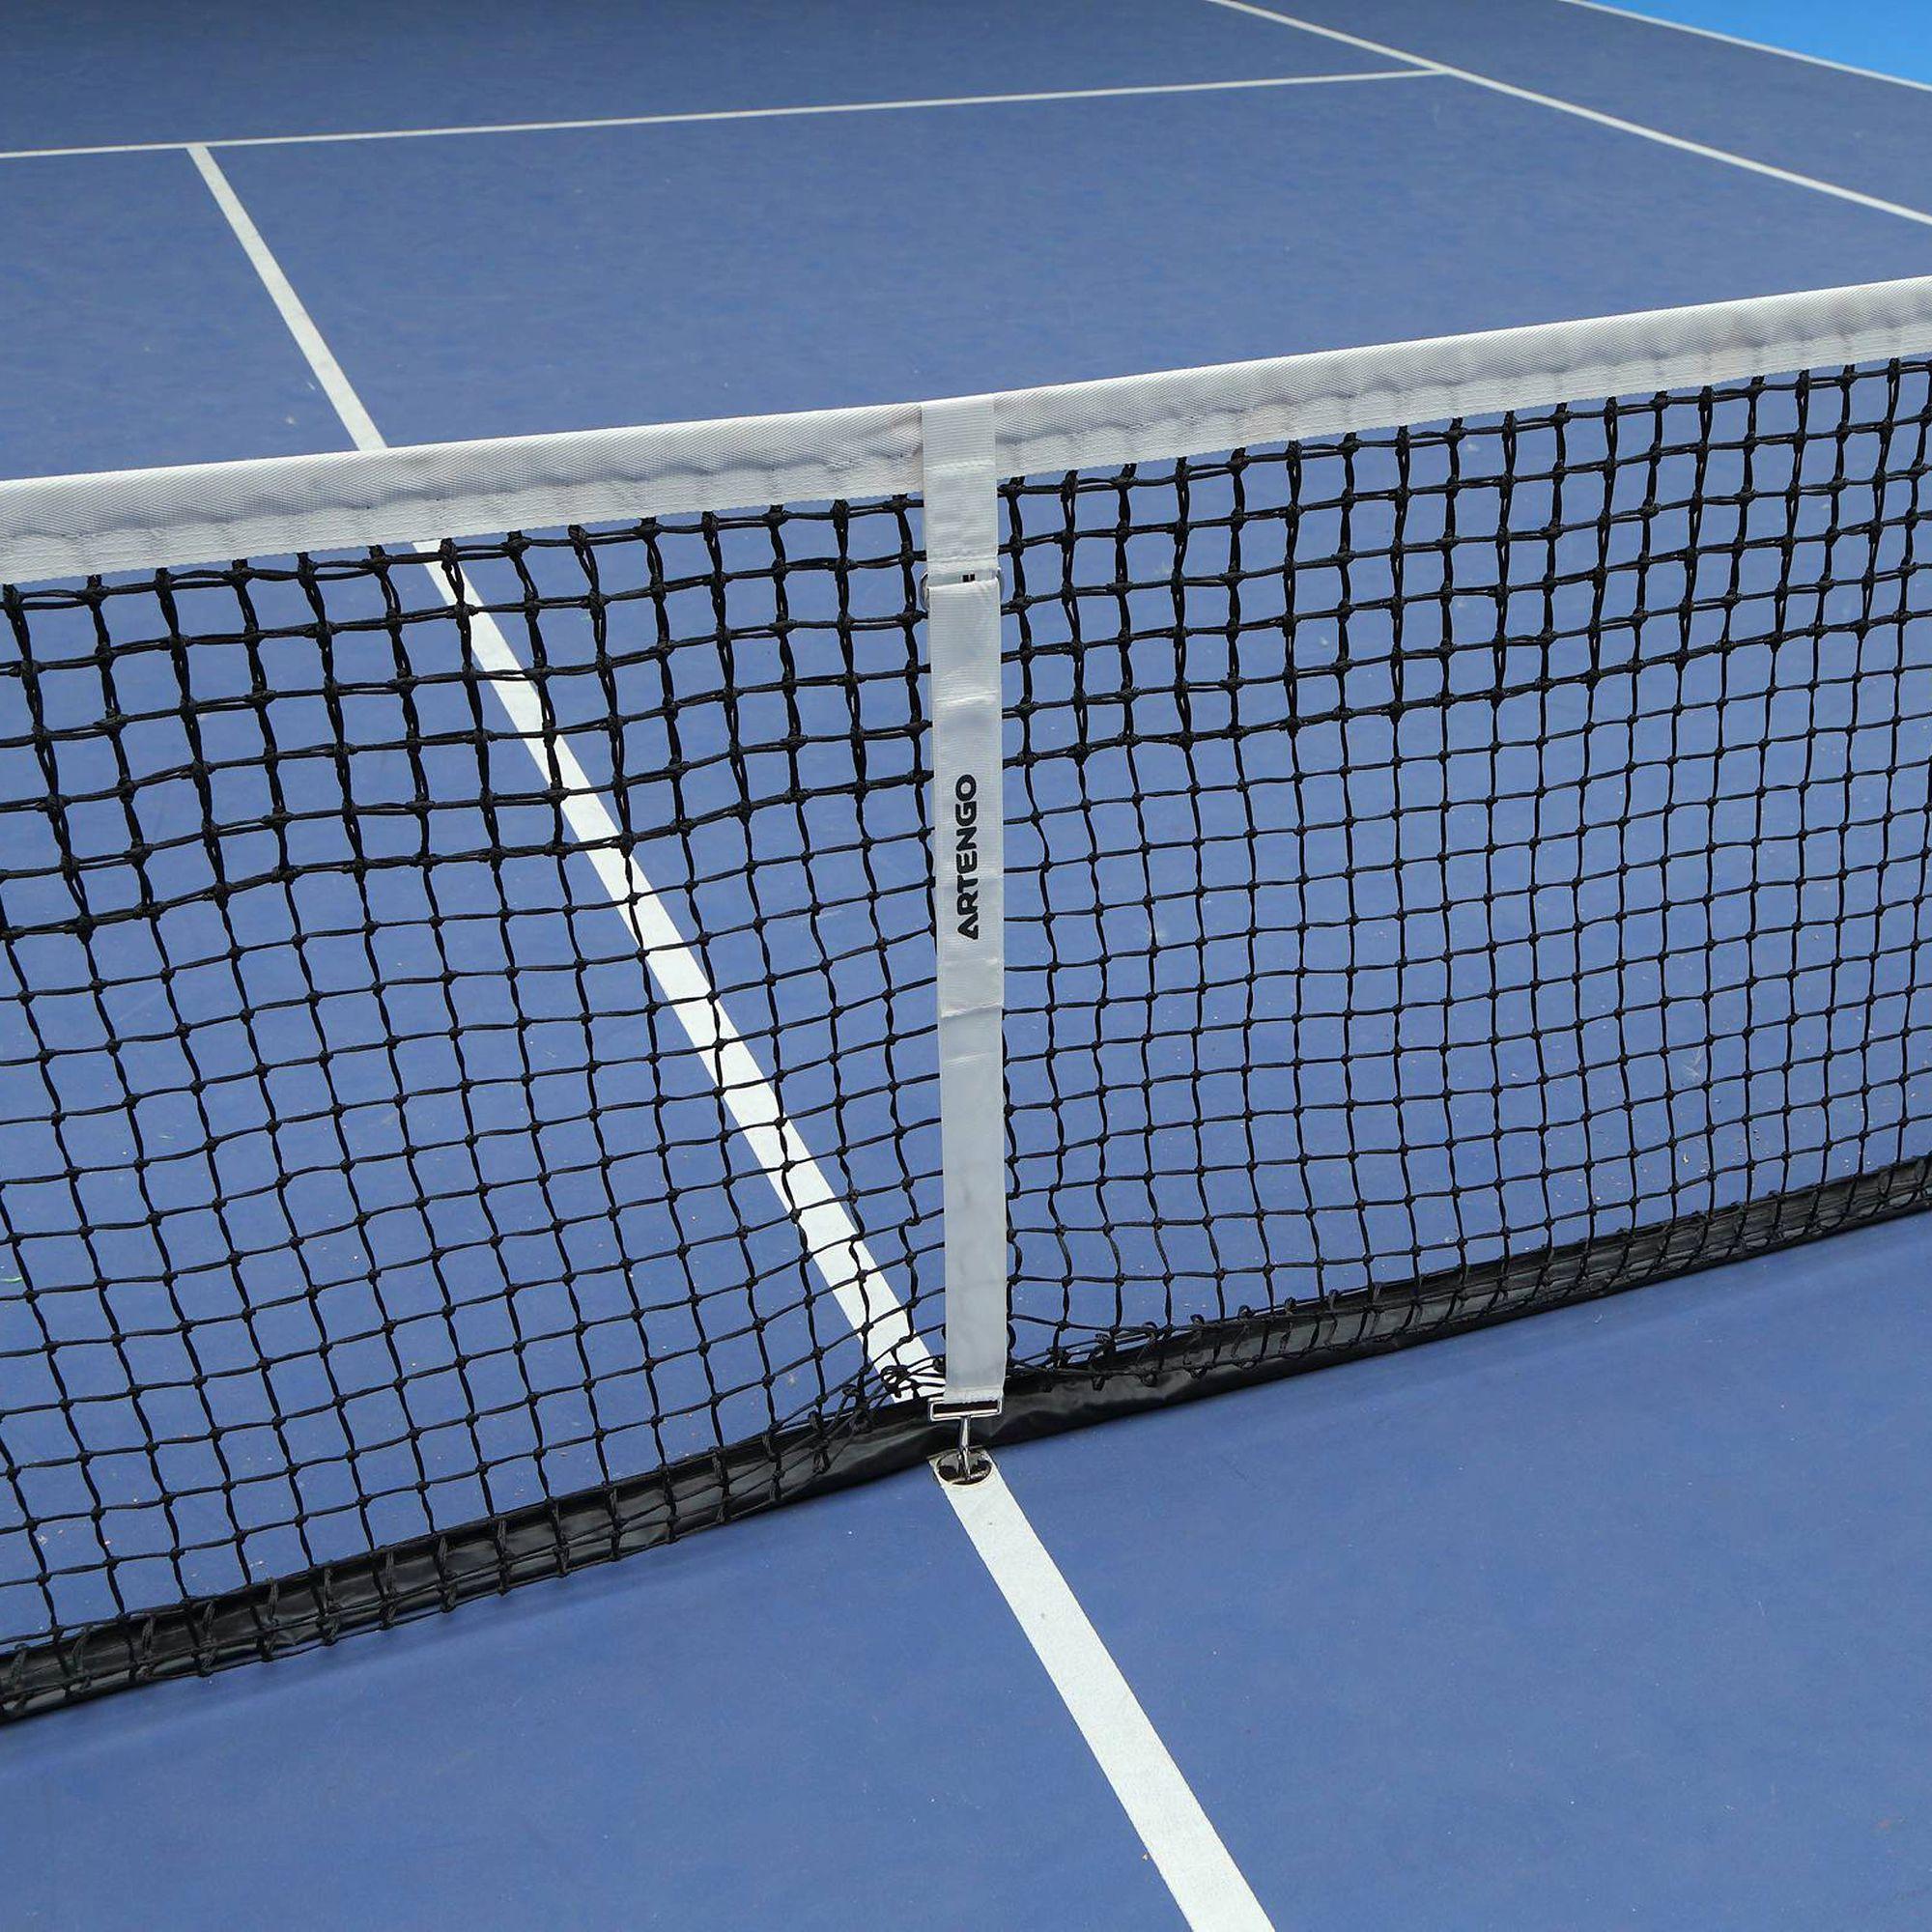 Filet de tennis regulator net artengo clubs for Dimension filet de tennis